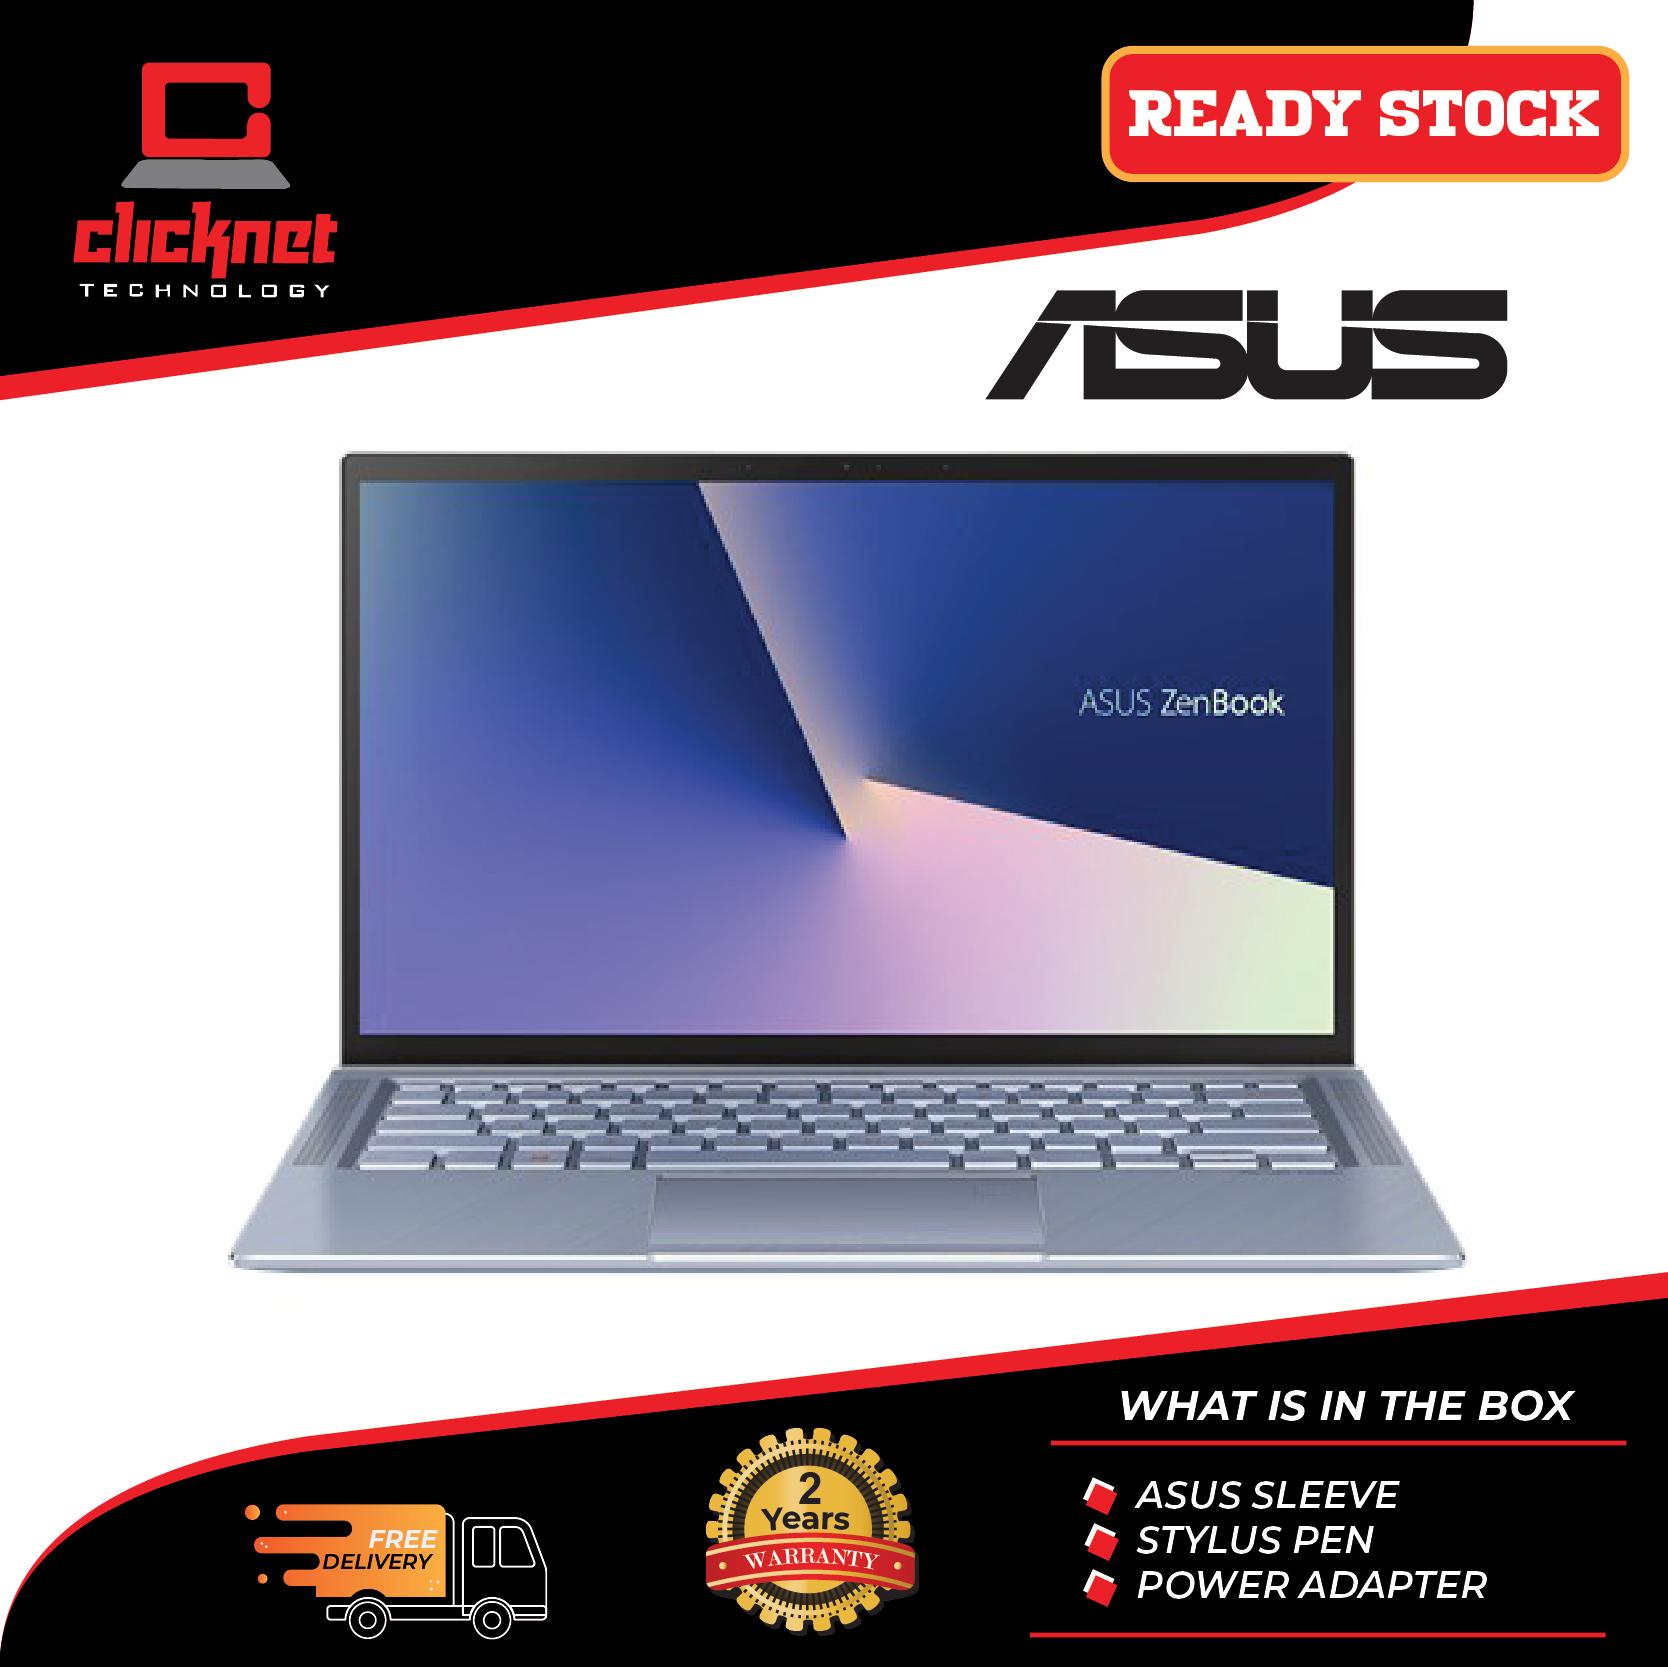 Asus Zenbook UM431D-AAM041T 14  FHD Laptop Silver Blue (Ryzen 5-3500U, 8GB, 512GB SSD, ATI, W10) Malaysia